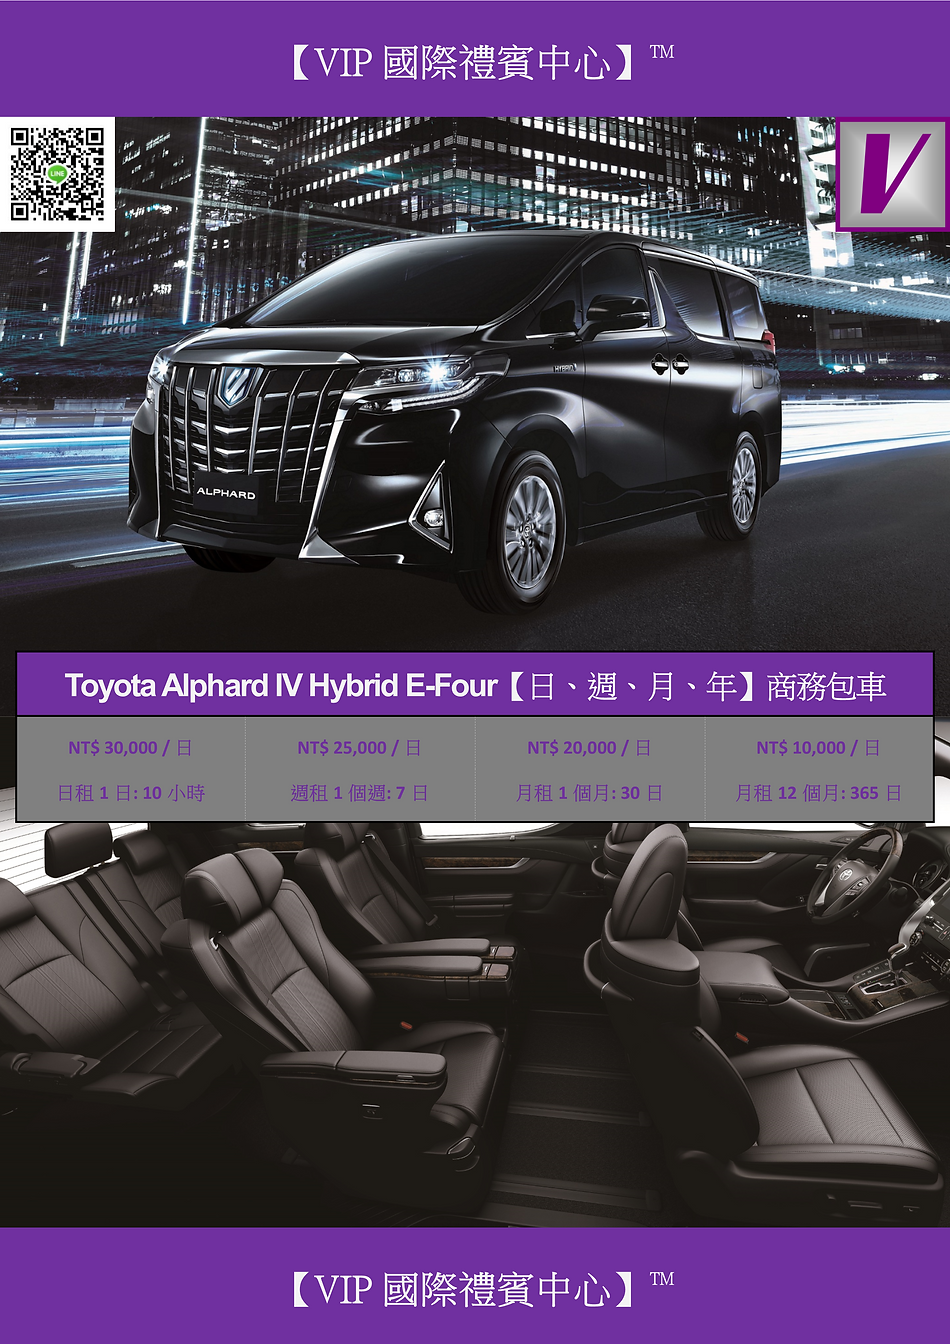 VIP國際禮賓中心 TOYOTA ALPHARD IV HYBRID E-FOU